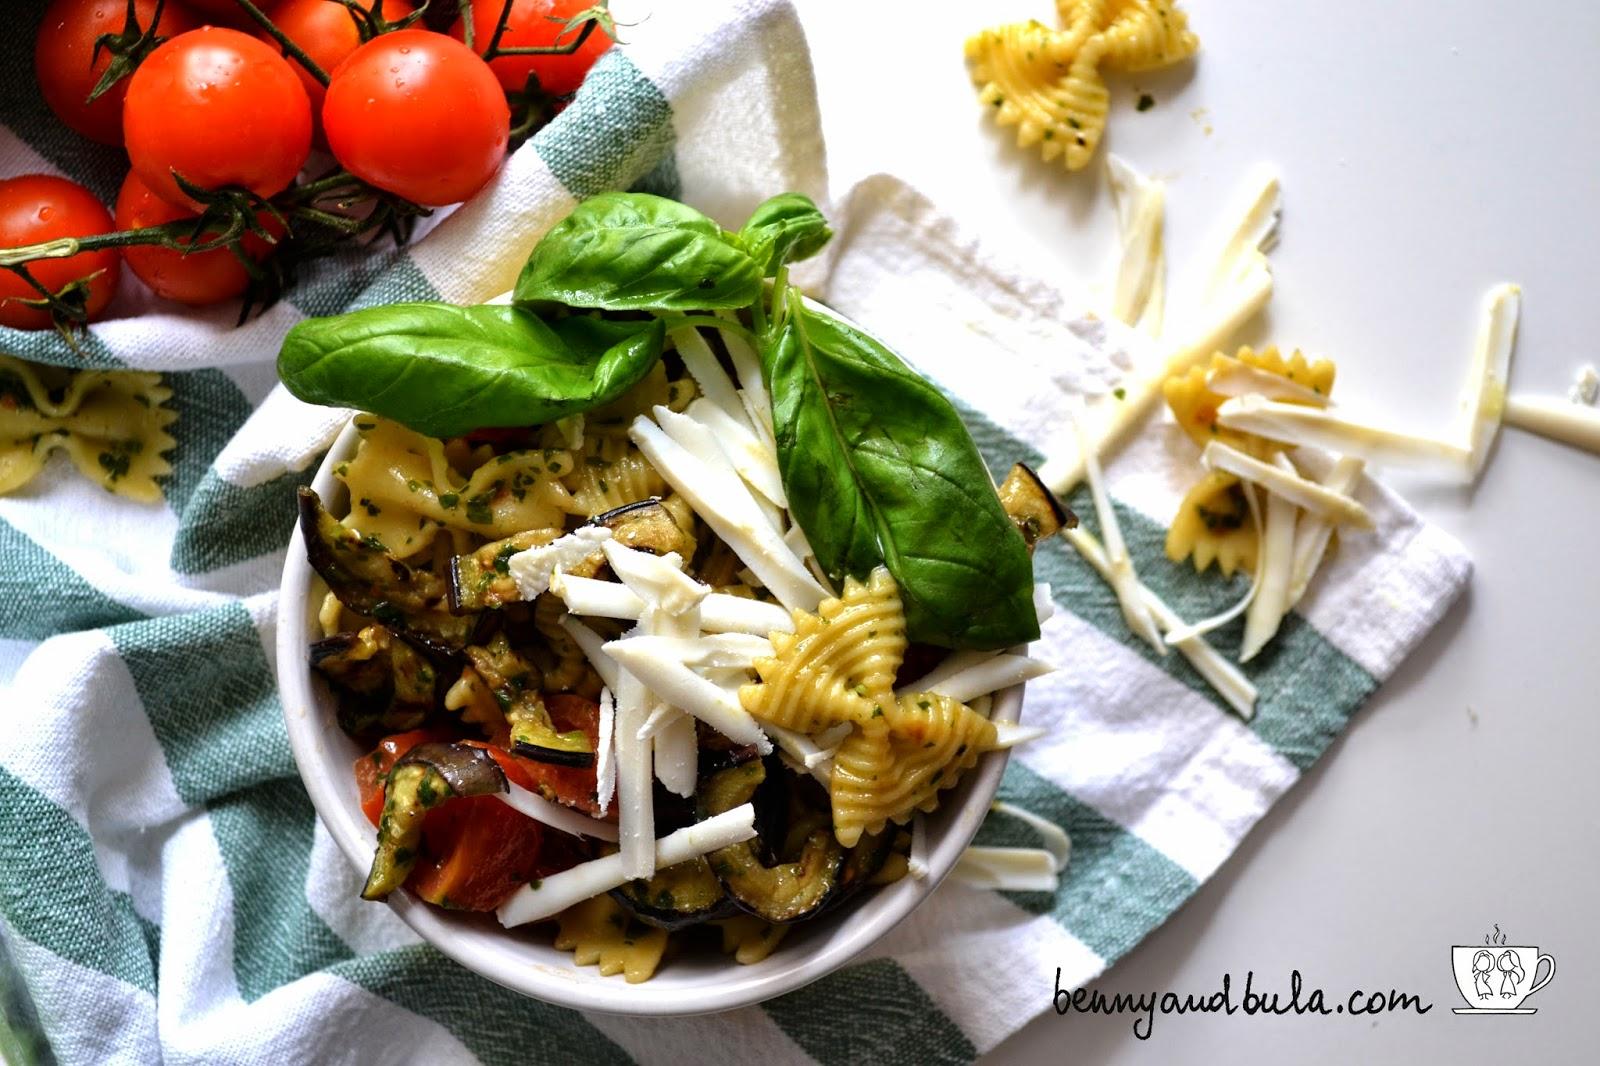 insalata di farfalle alla norma/pasta fredda ricotta salata melanzane / pasta salad